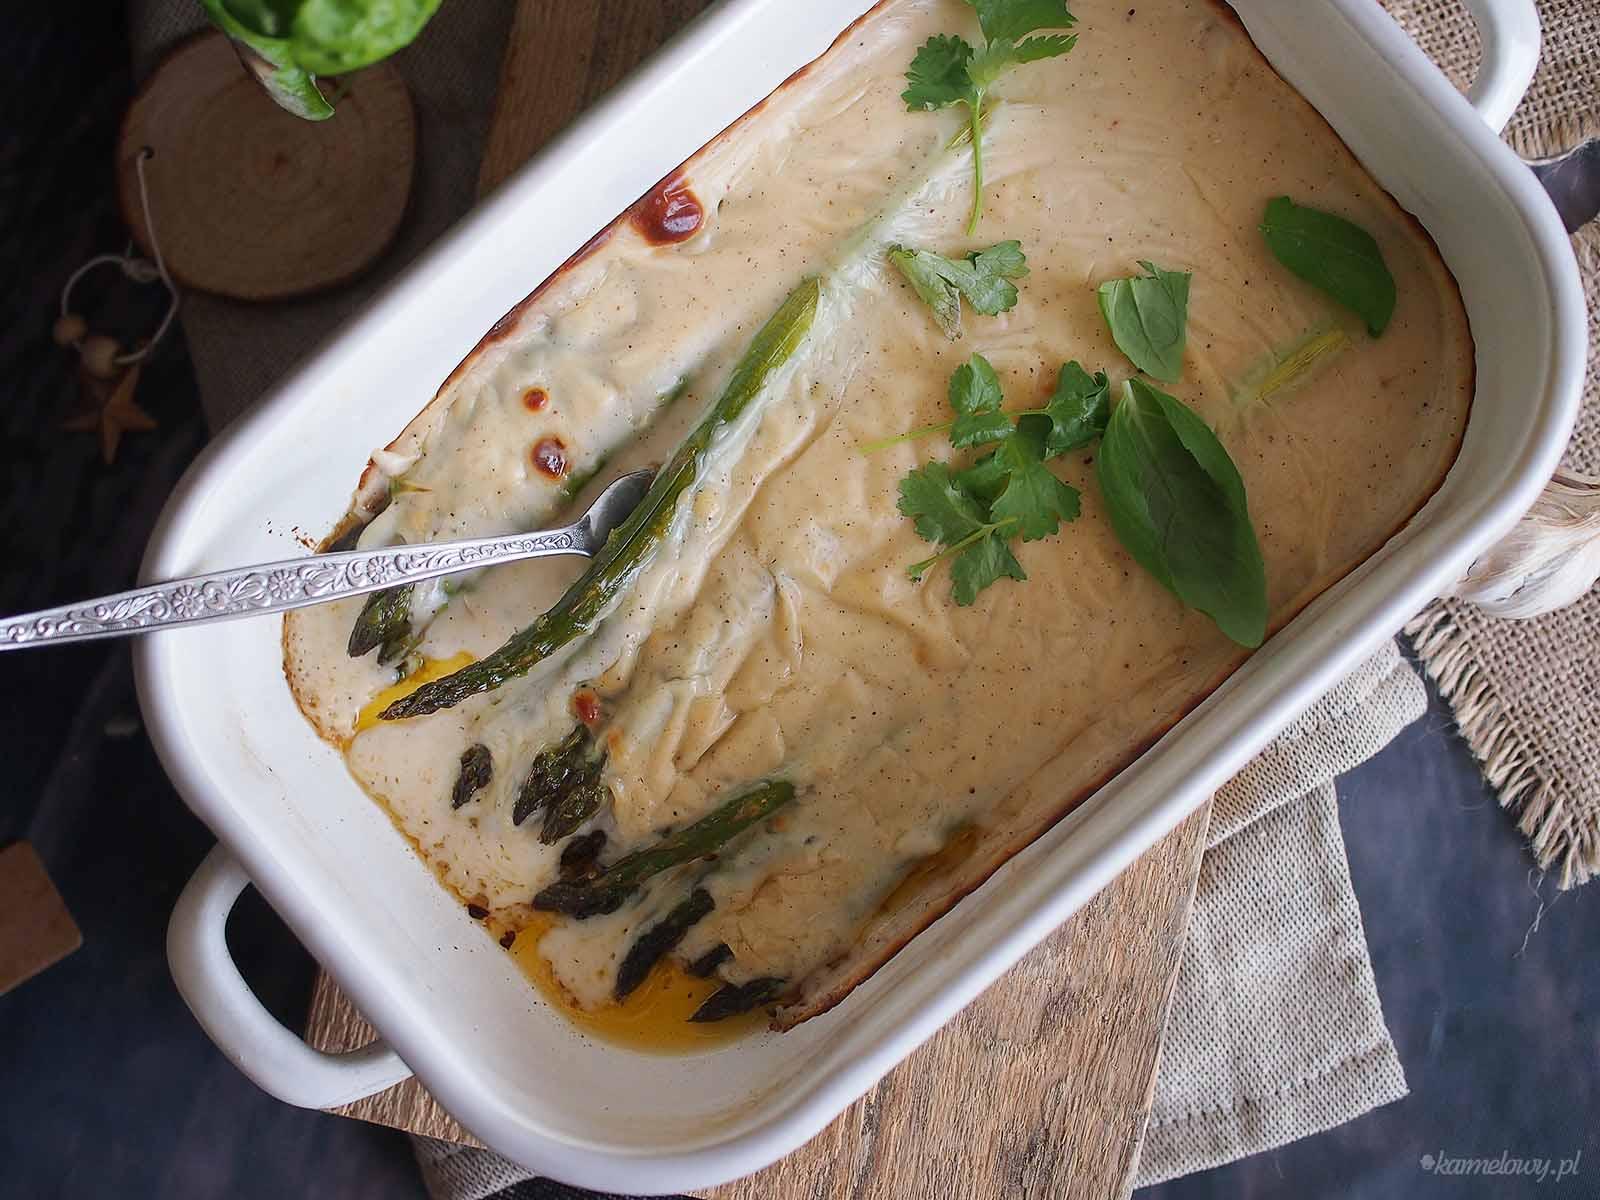 Szparagi-zapiekane-pod-beszamelem-Asparagus-baked-with-bechamel-sauce